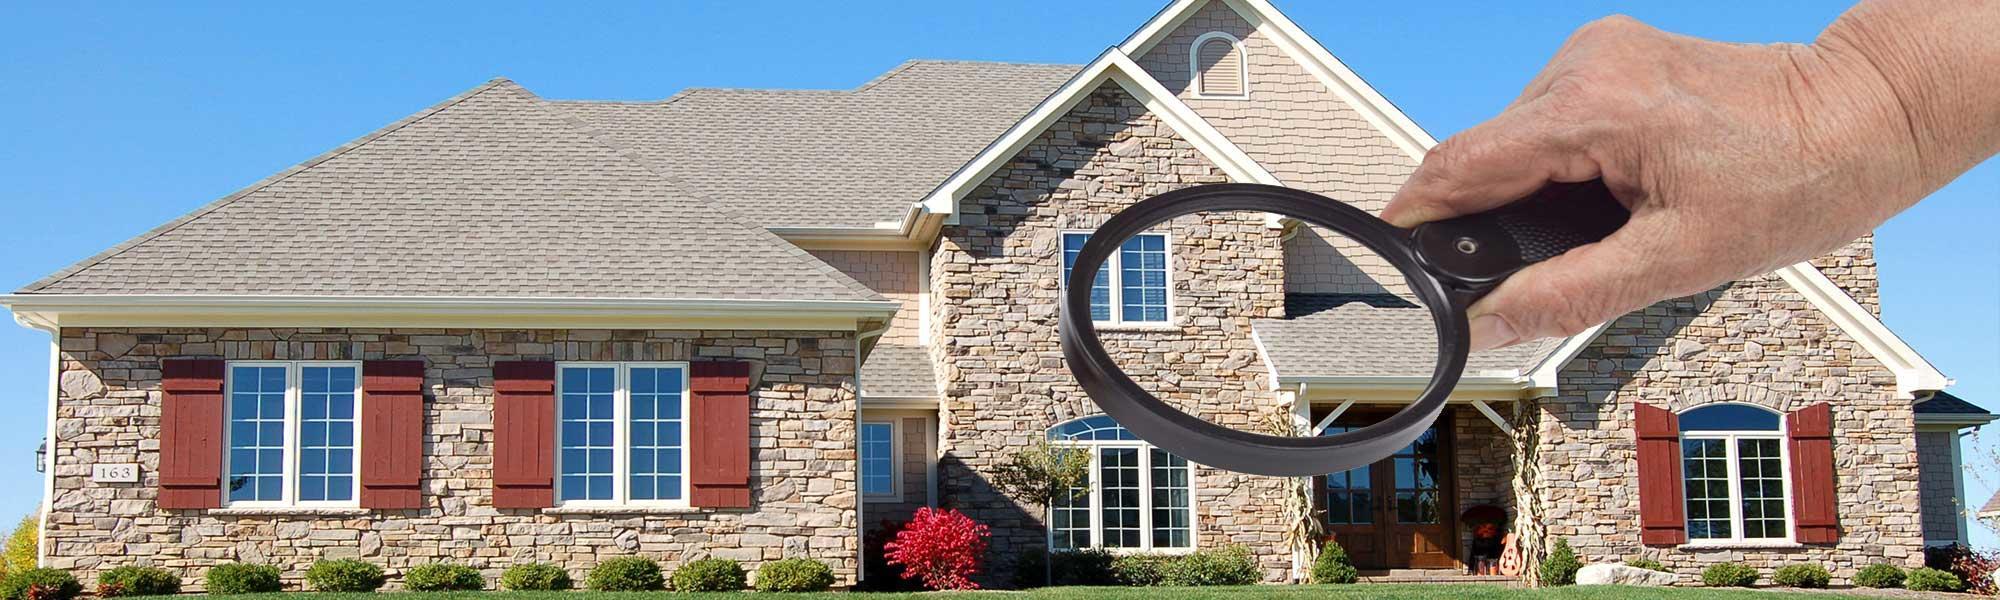 Acumen Home Inspection Professional LLC image 0